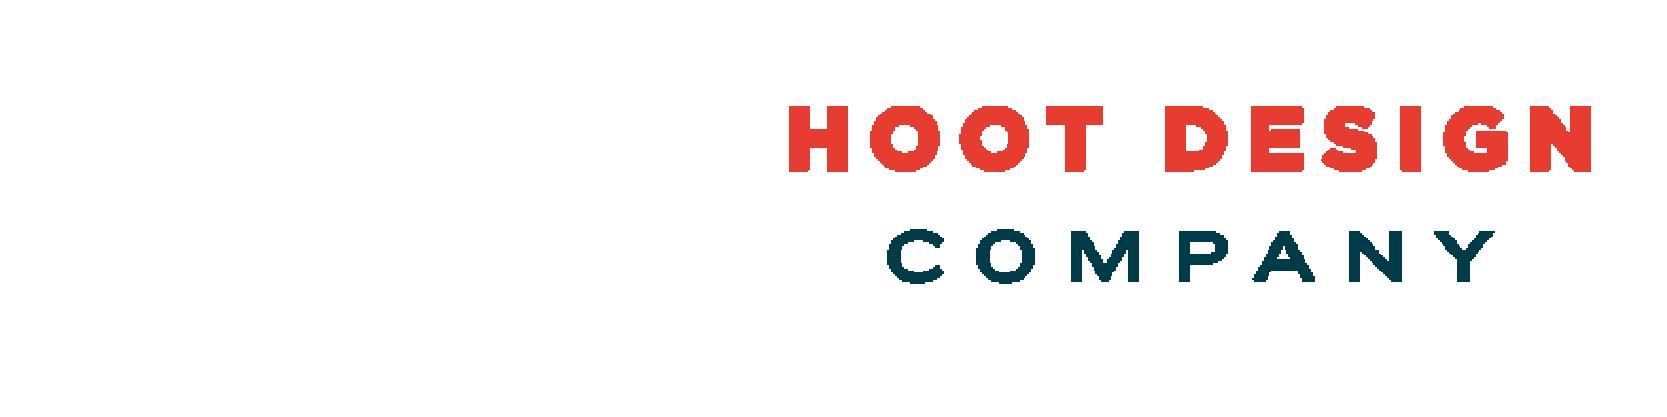 profresh-hootdesignco-16.png